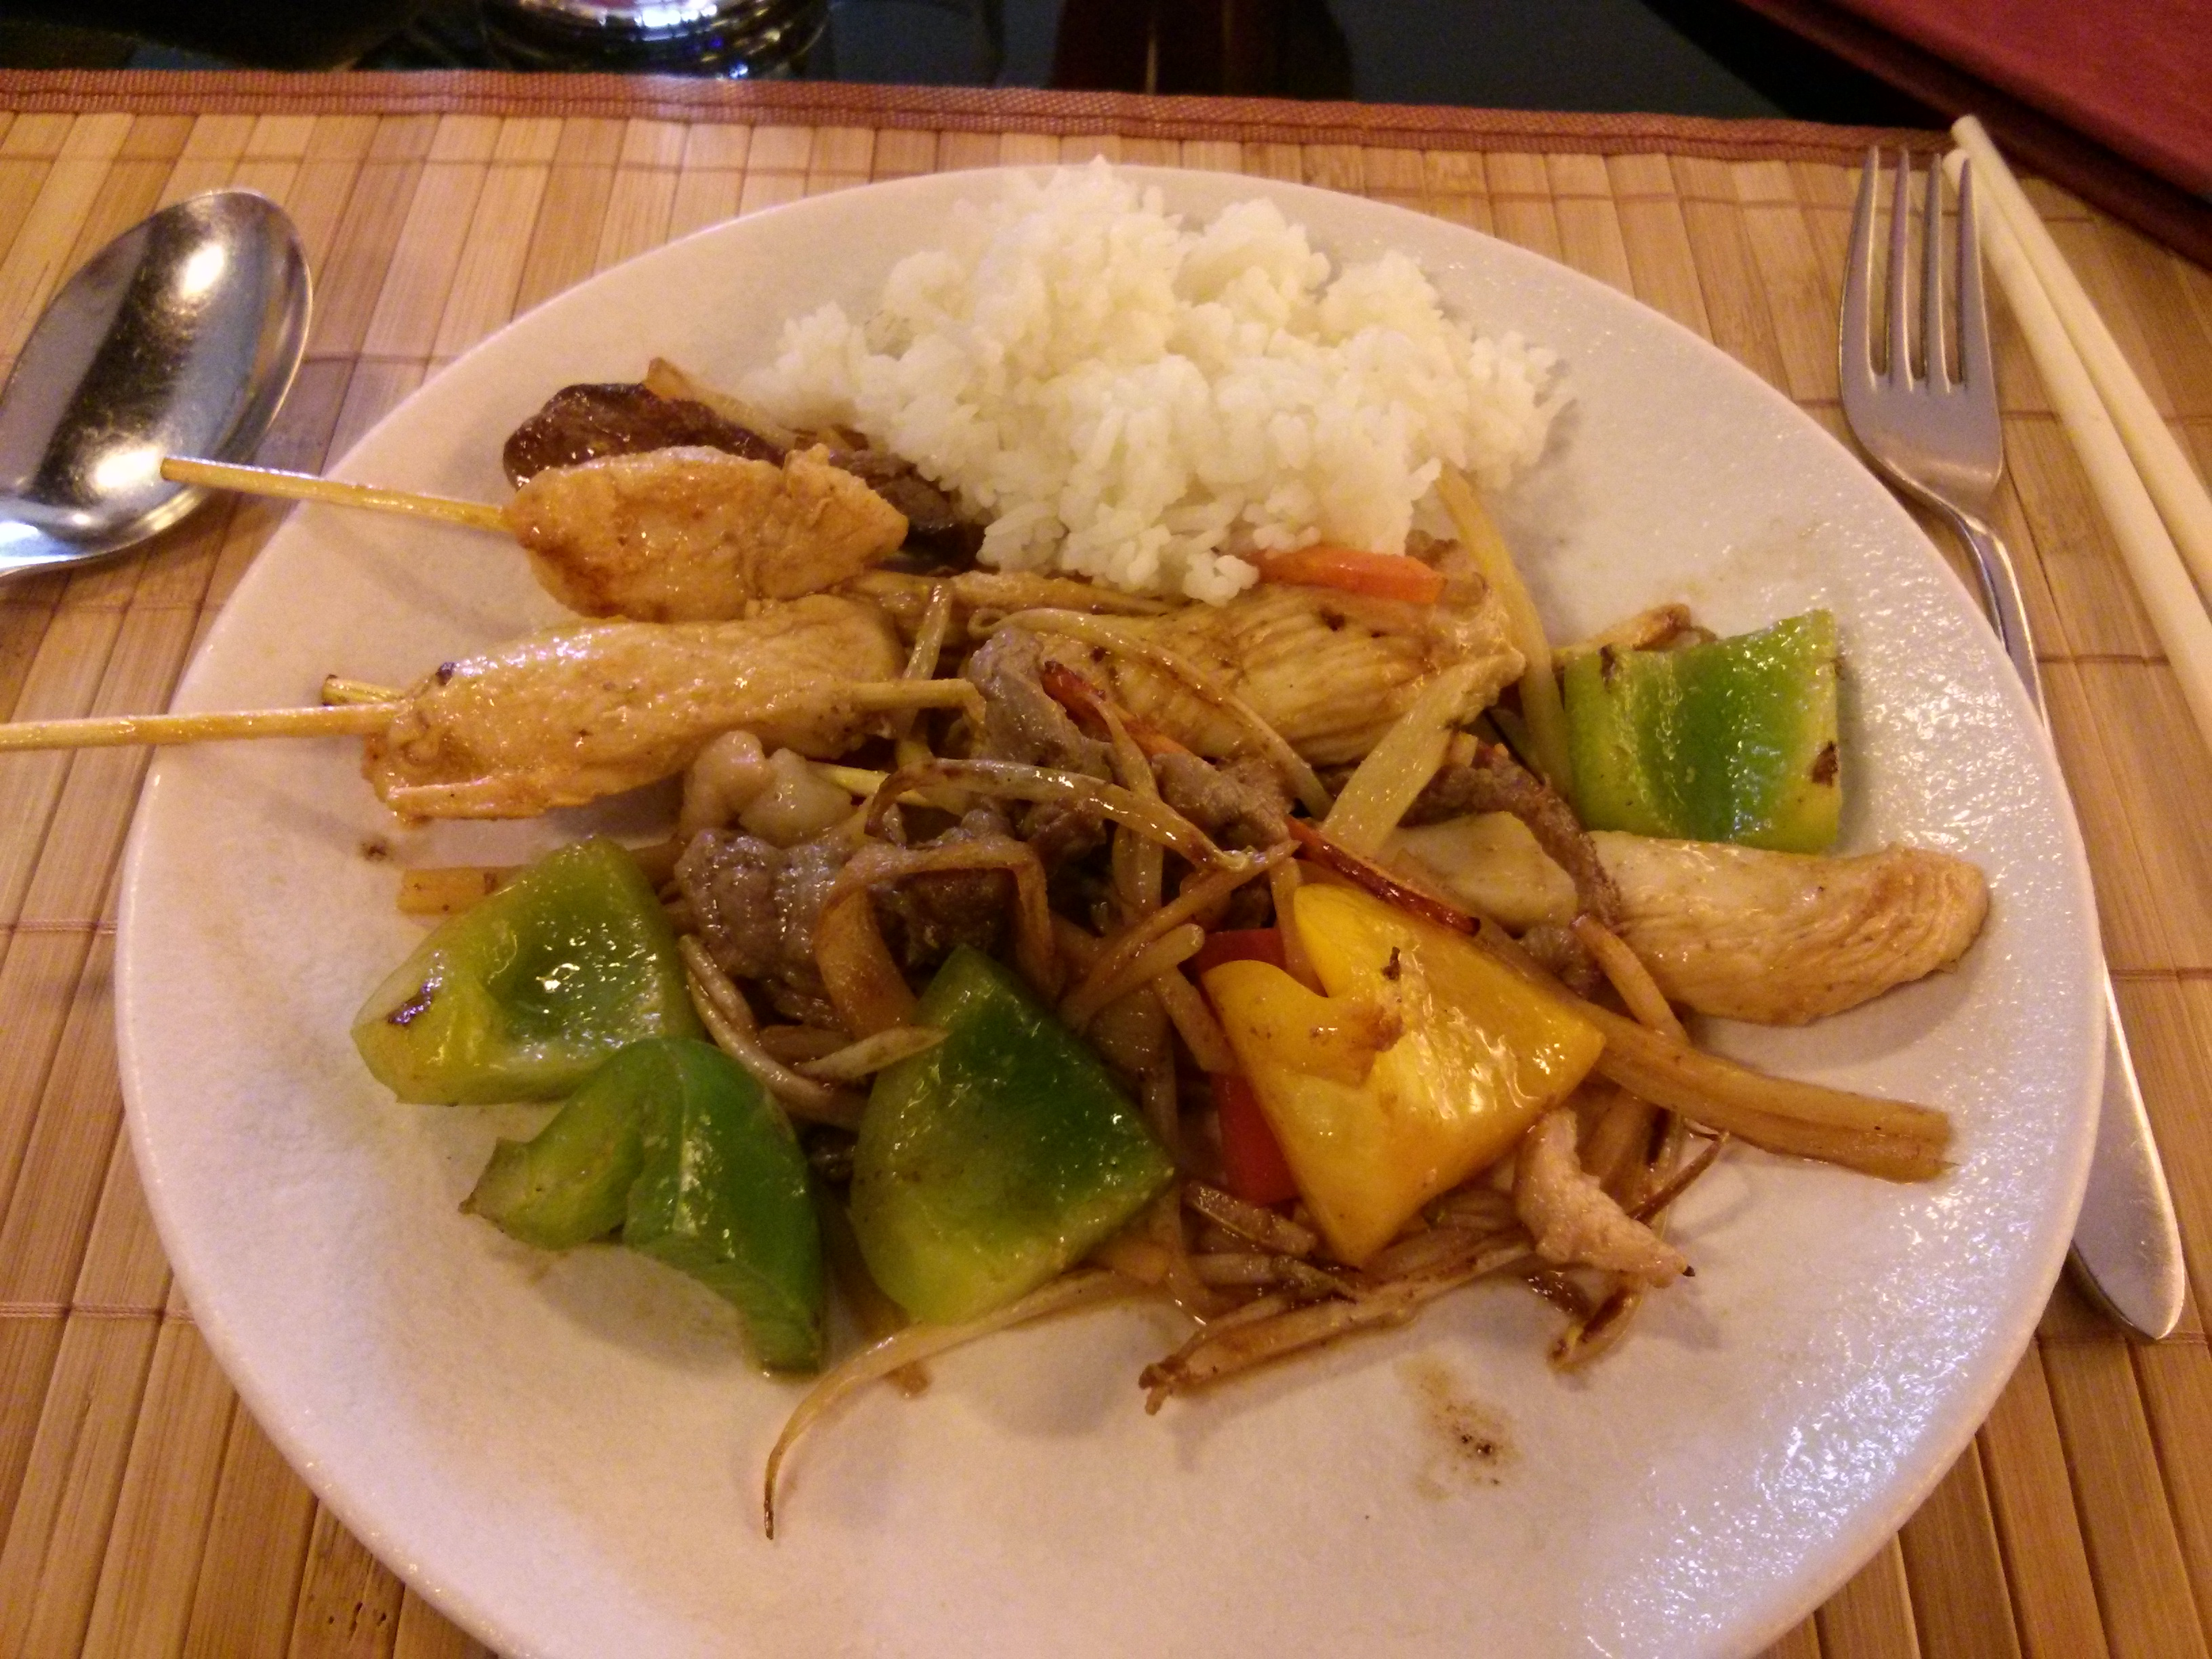 https://foodloader.net/nico_2013-11-01_sky-palace-asia-3-gemischtes-frisch-gebraten.jpg